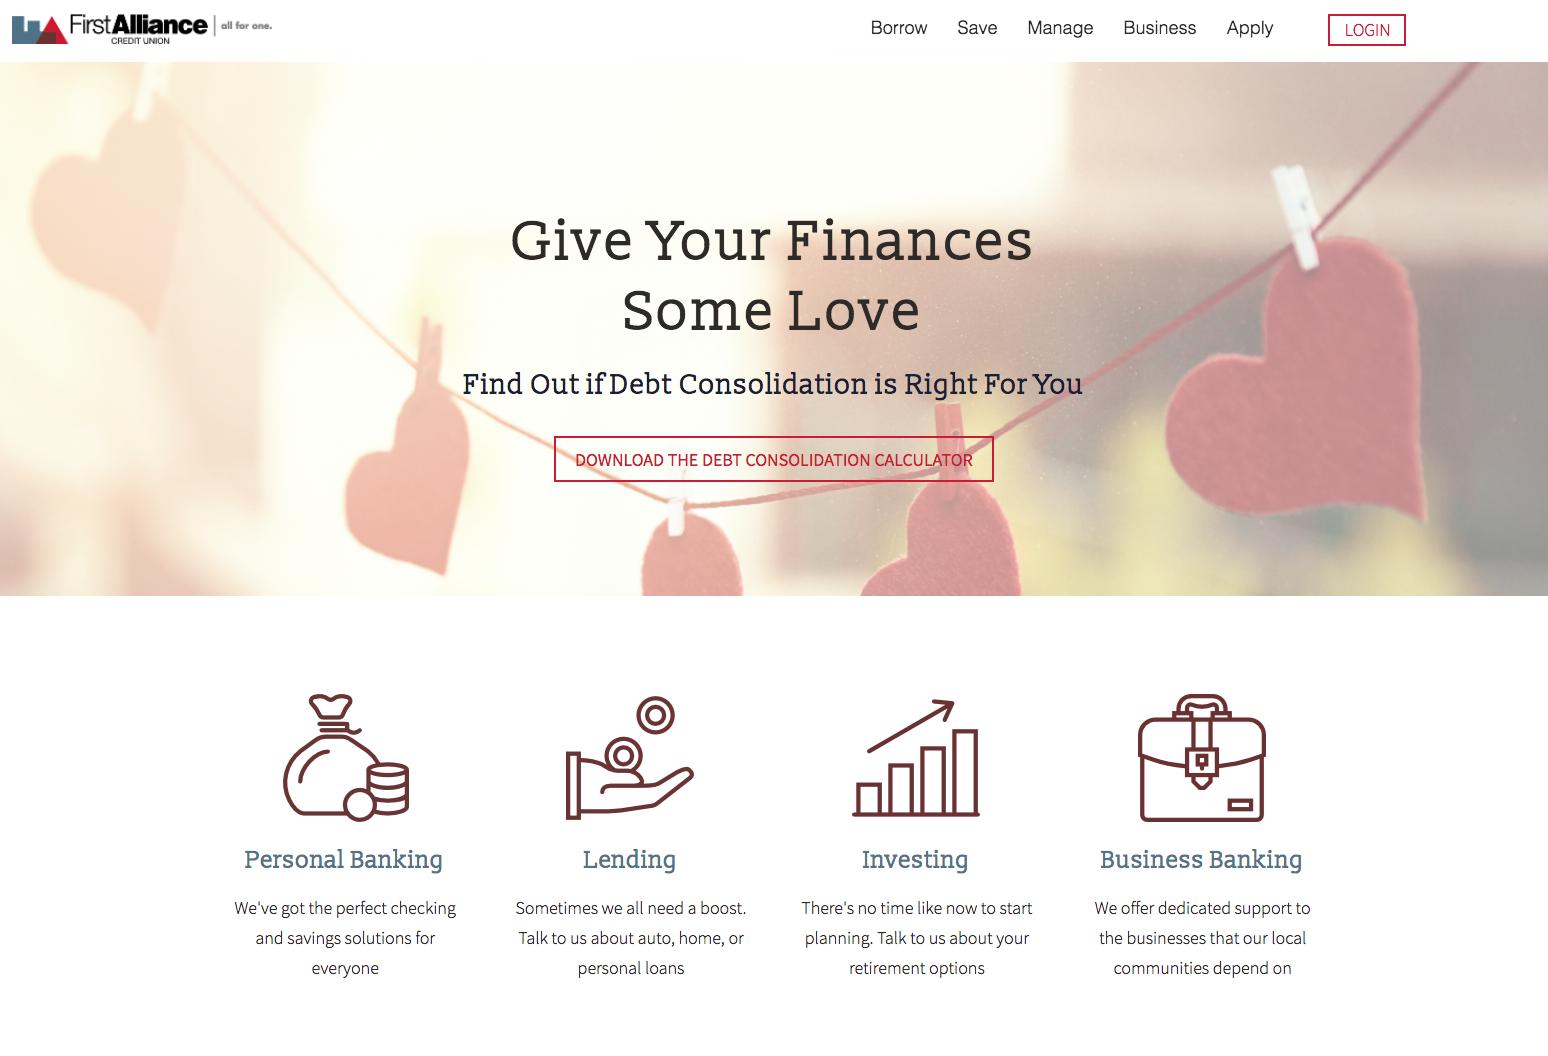 credit union marketing case study